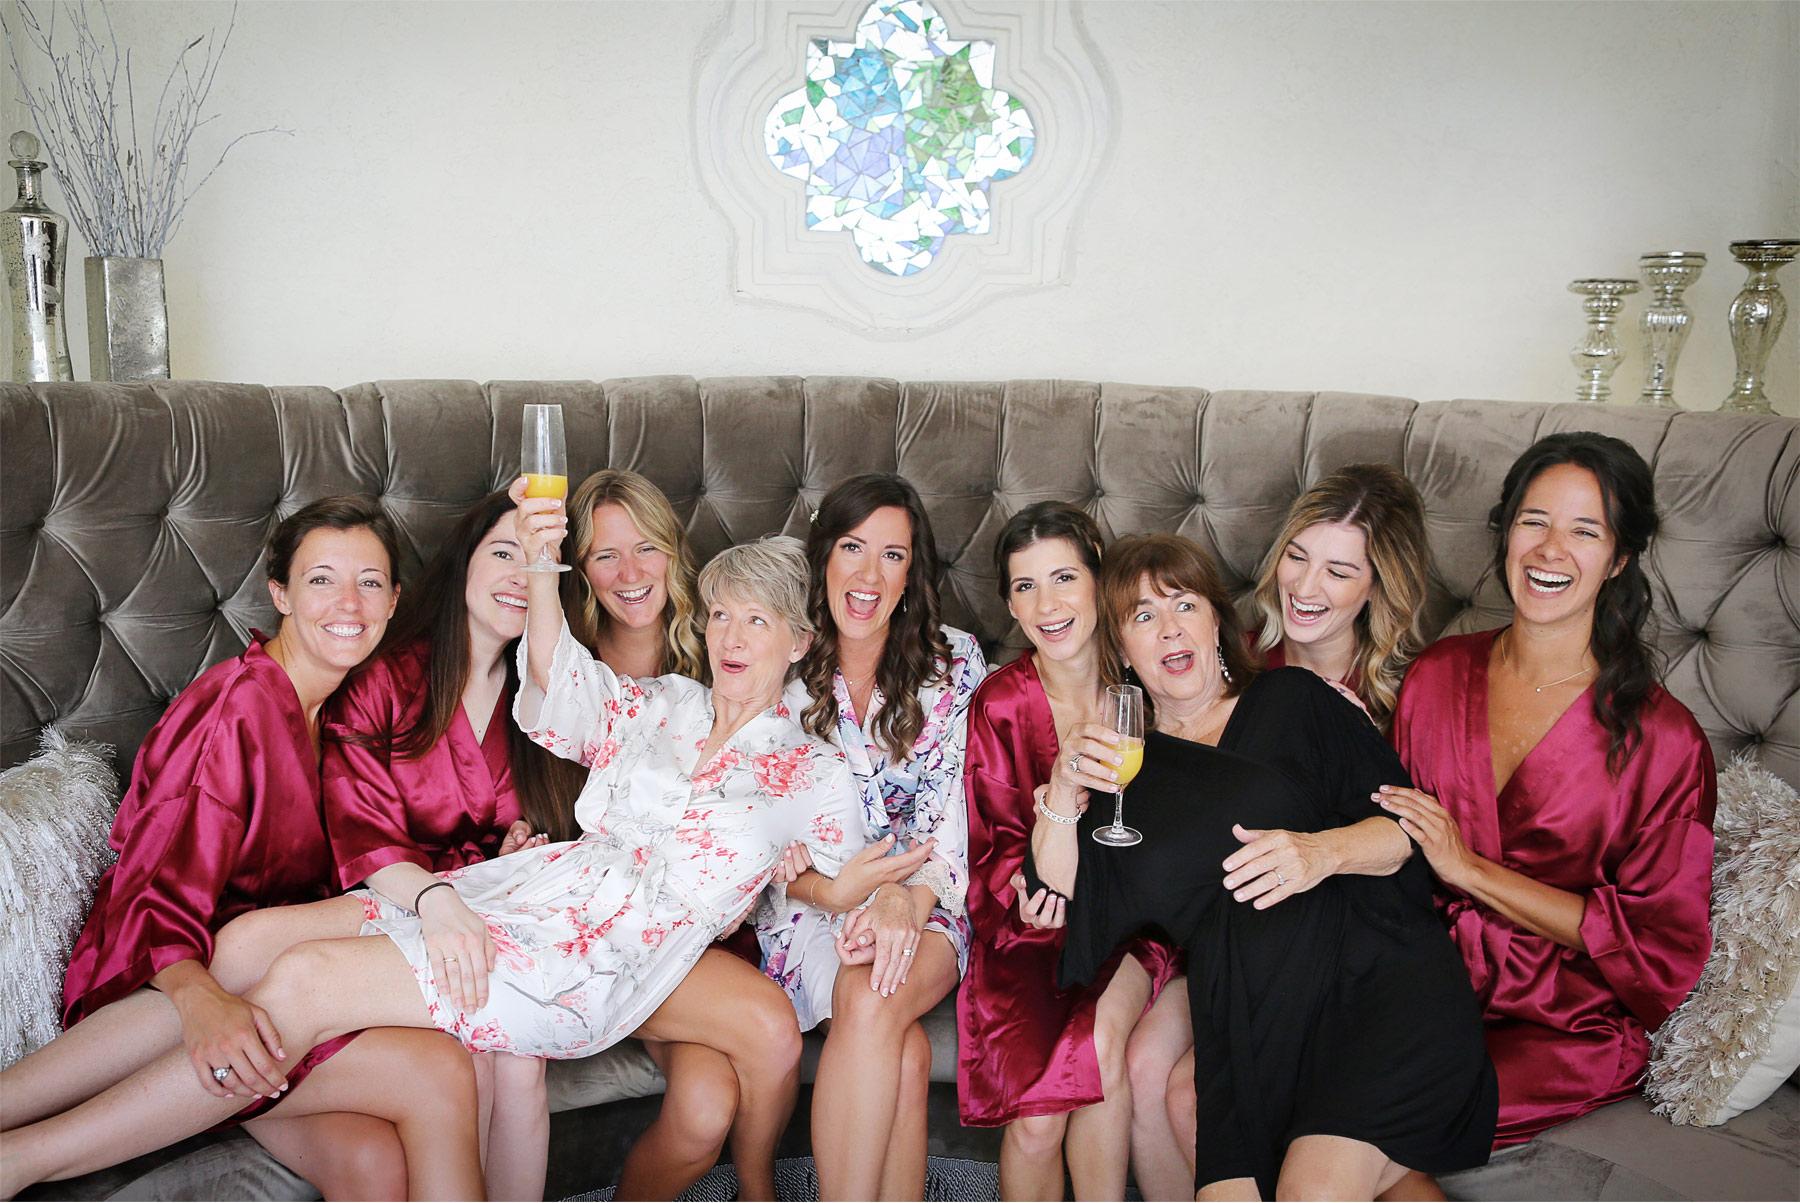 01-Weding-by-Vick-Photography-Minneapolis-Minnesota-Bavaria-Downs-Bride-Bridesmaids-Mother-Rebecca-and-Mark.jpg